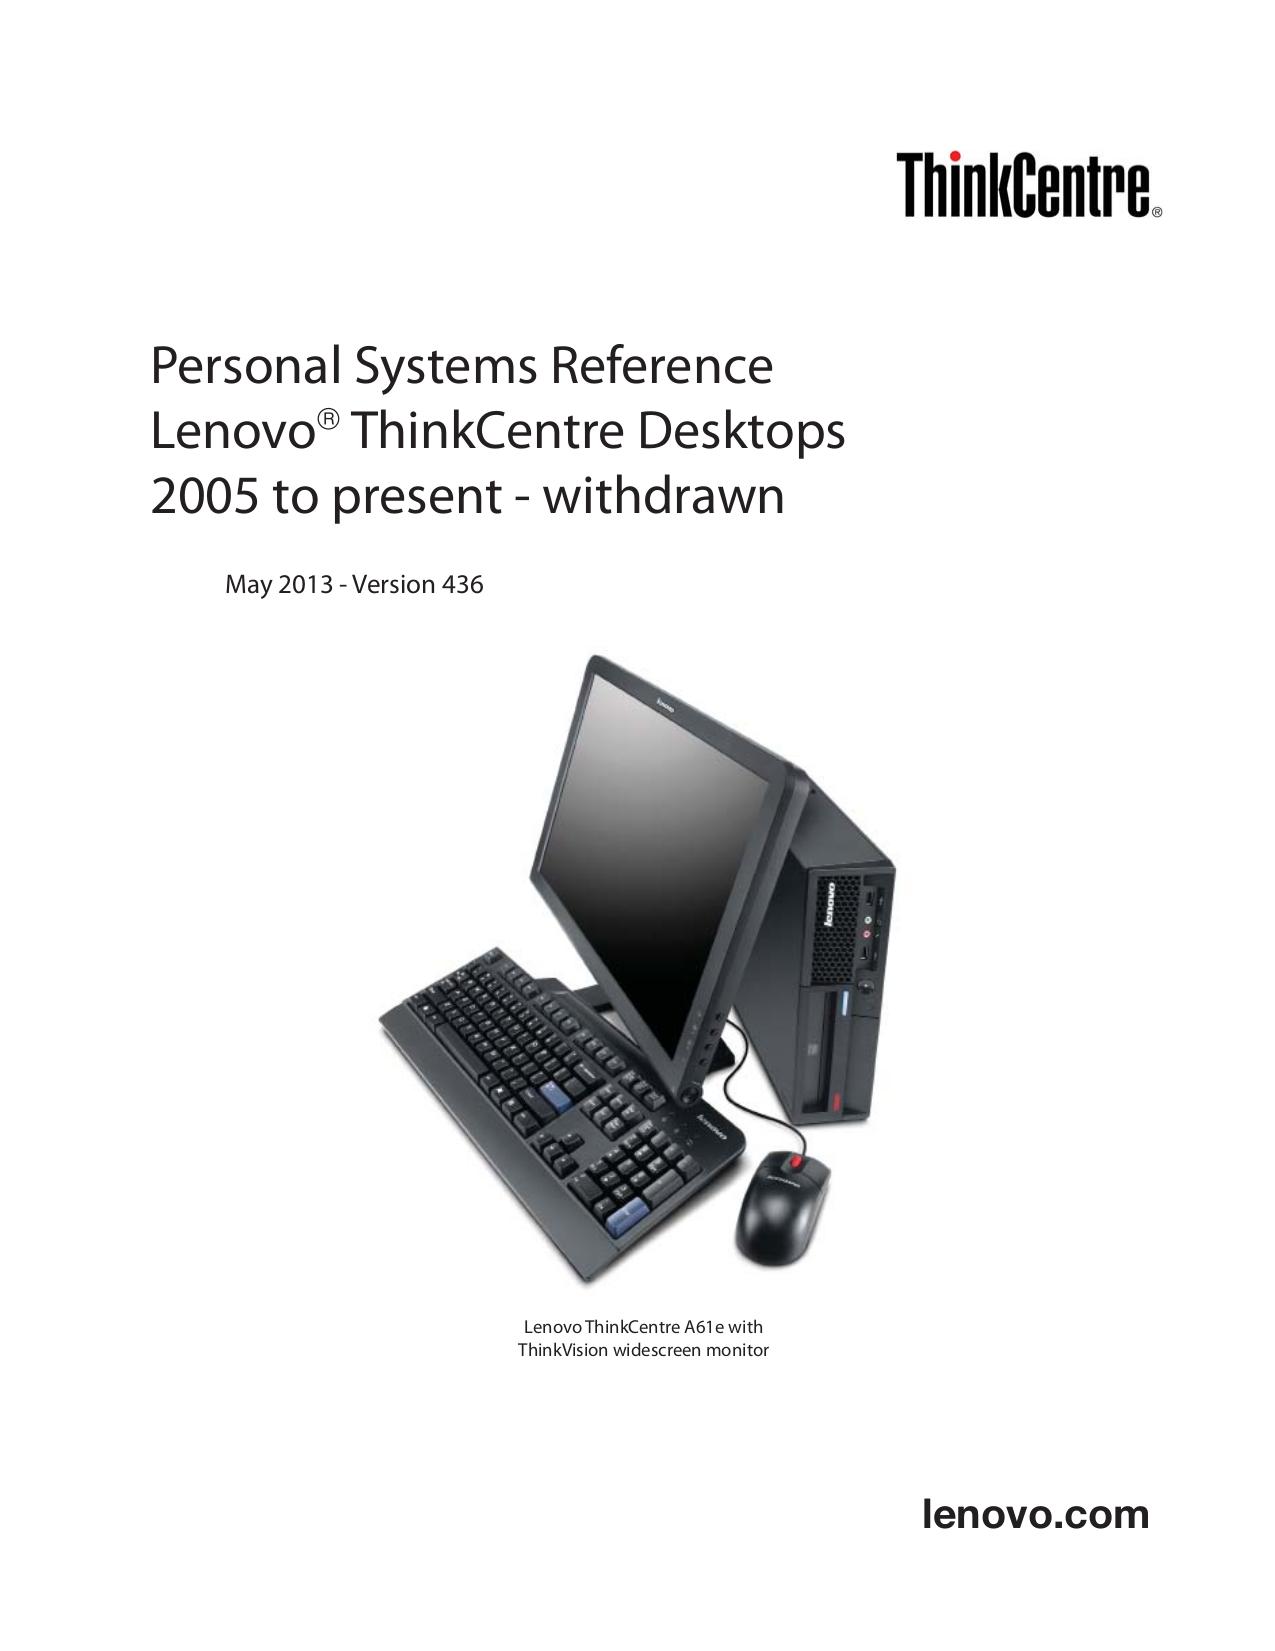 pdf for Lenovo Desktop ThinkCentre E50 9214 manual